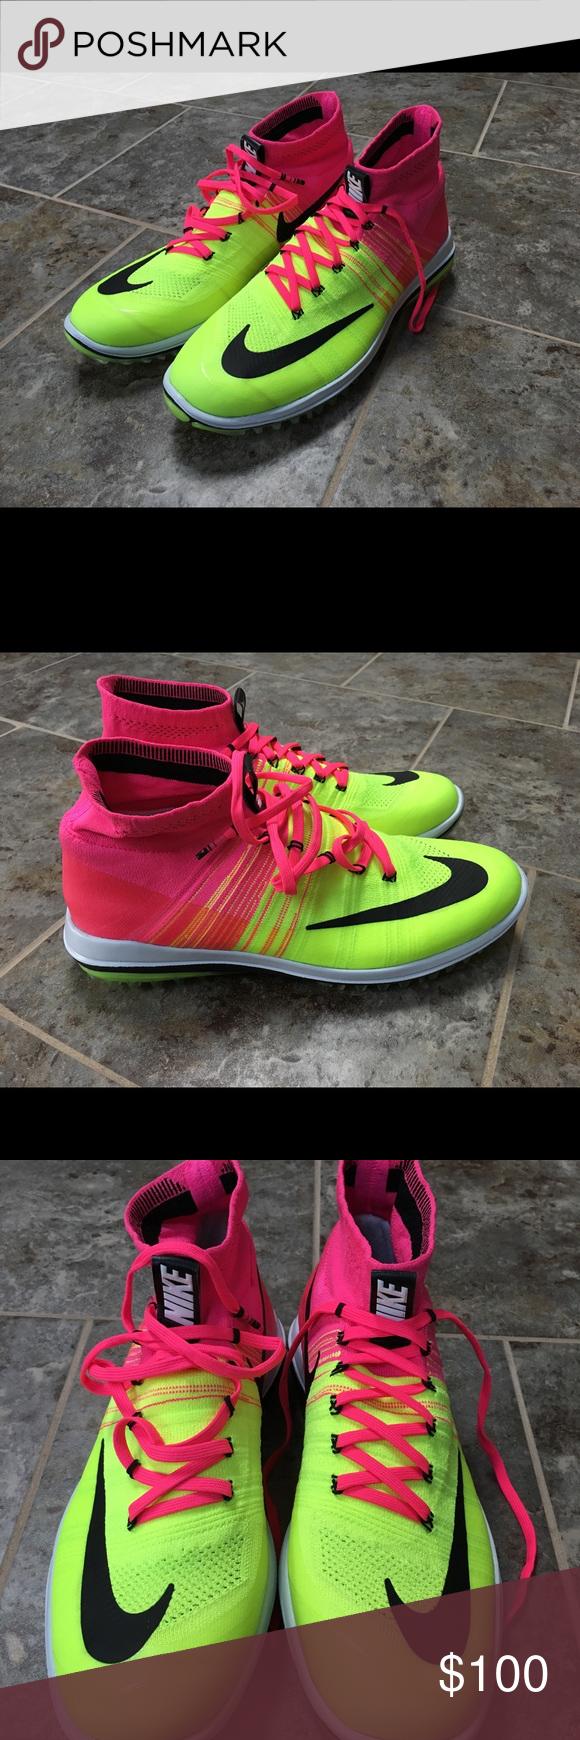 32ed88dd0589 Nike Flyknit Elite Golf Shoes Size 10.5 Pink Blast Brand new ...